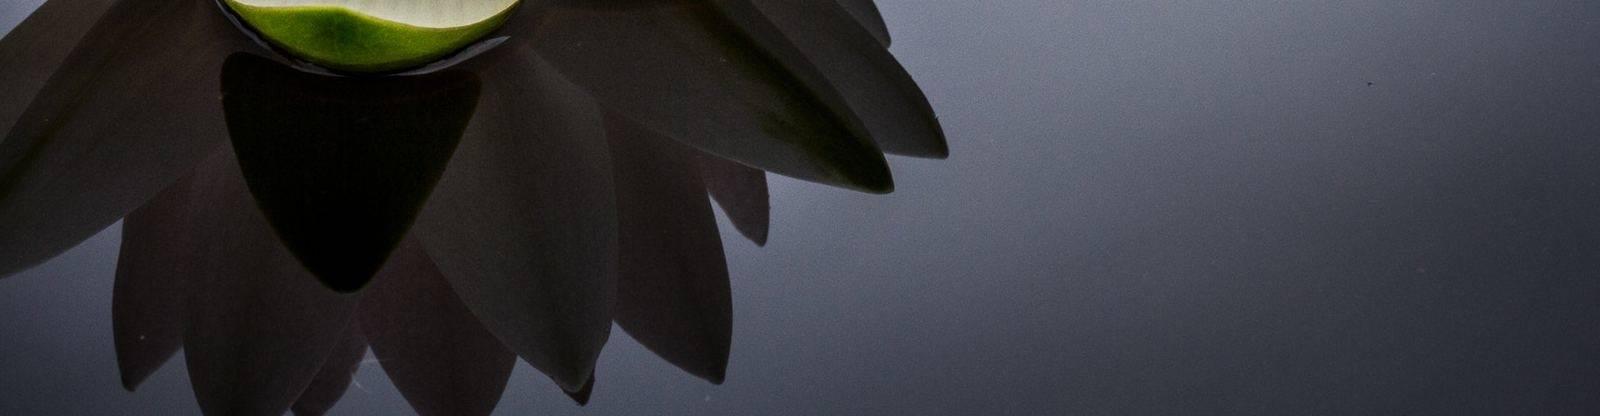 virmuze exhibit Lotus Blossom logo main banner